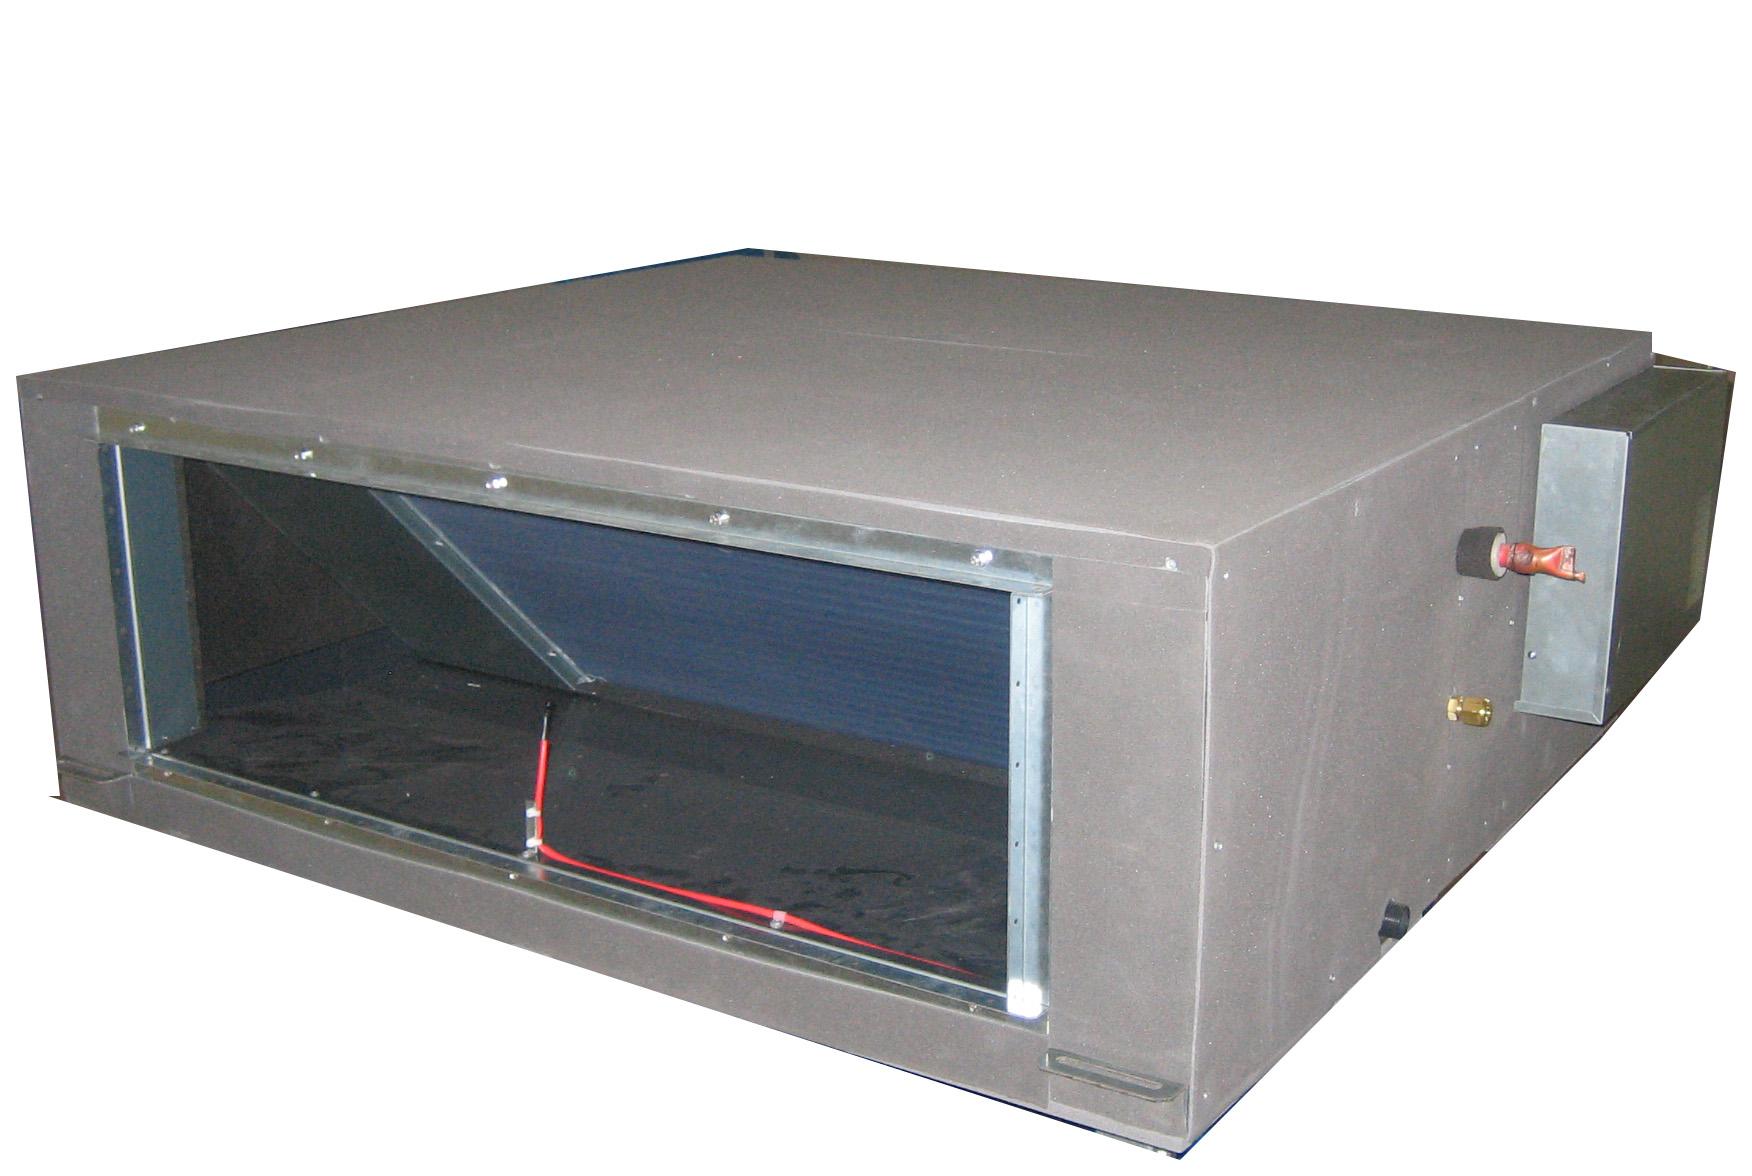 Vrf Indoor Unit Fresh Air Intake Toshiba Air